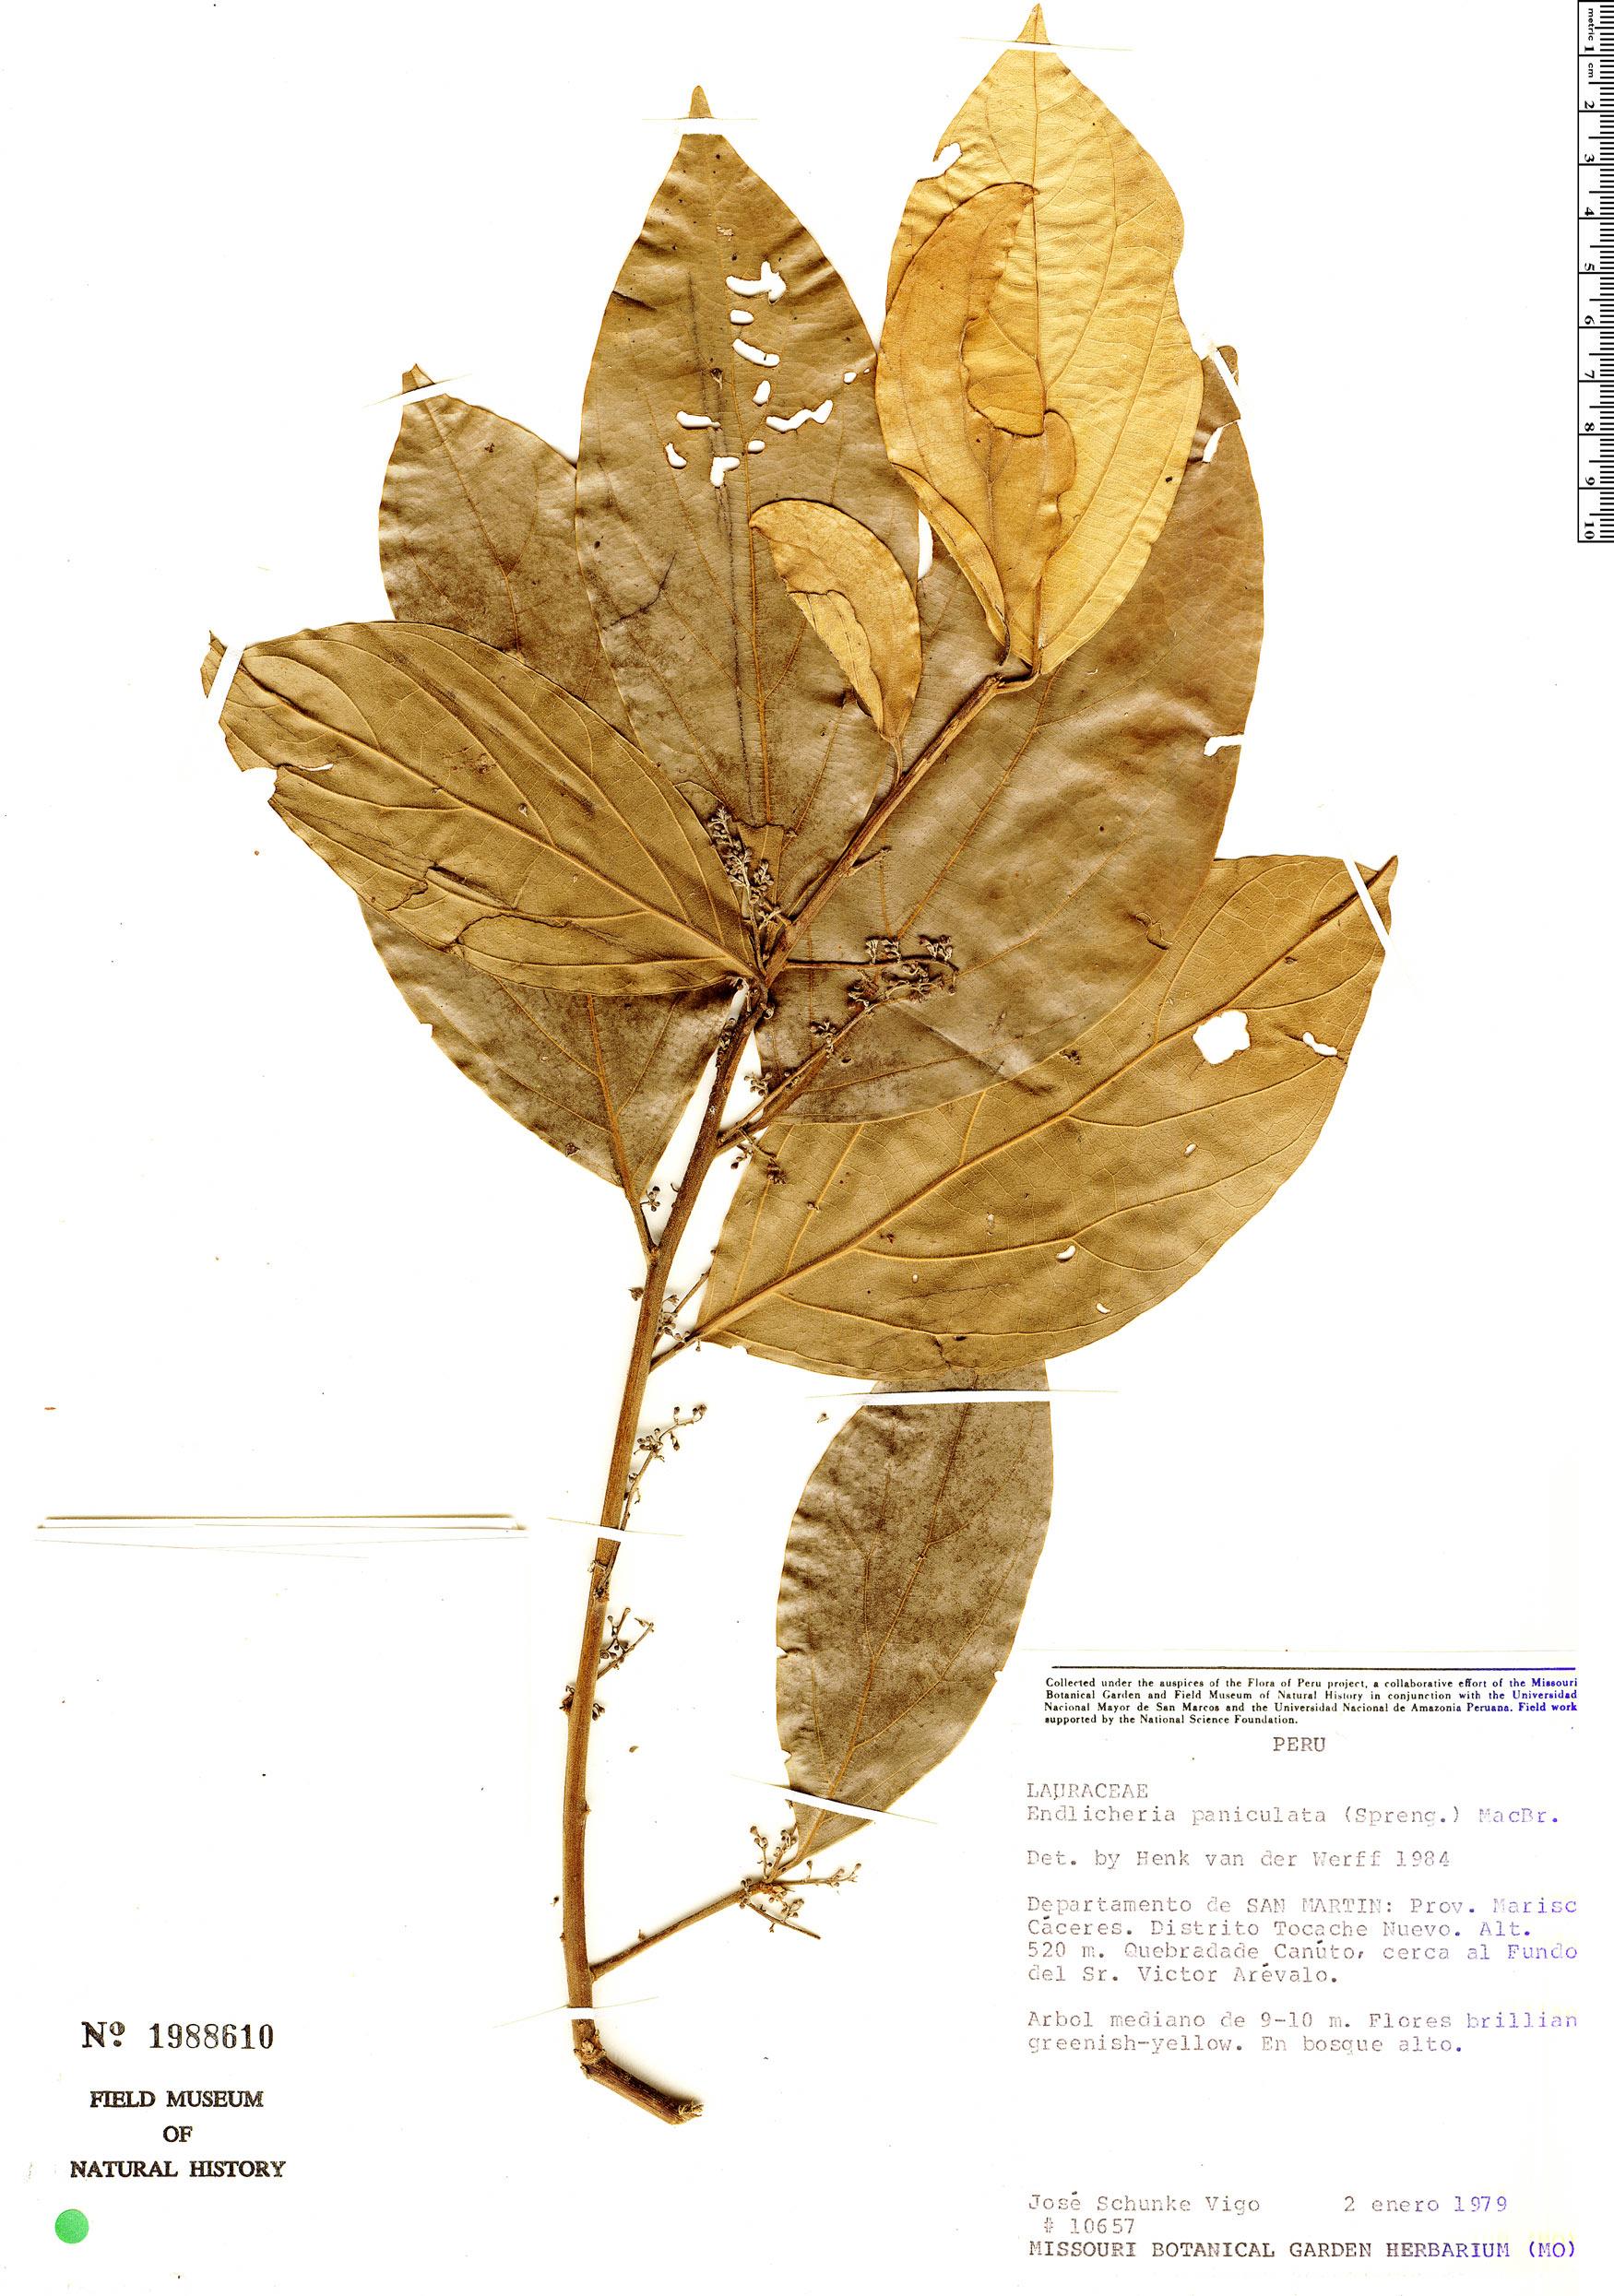 Specimen: Endlicheria paniculata